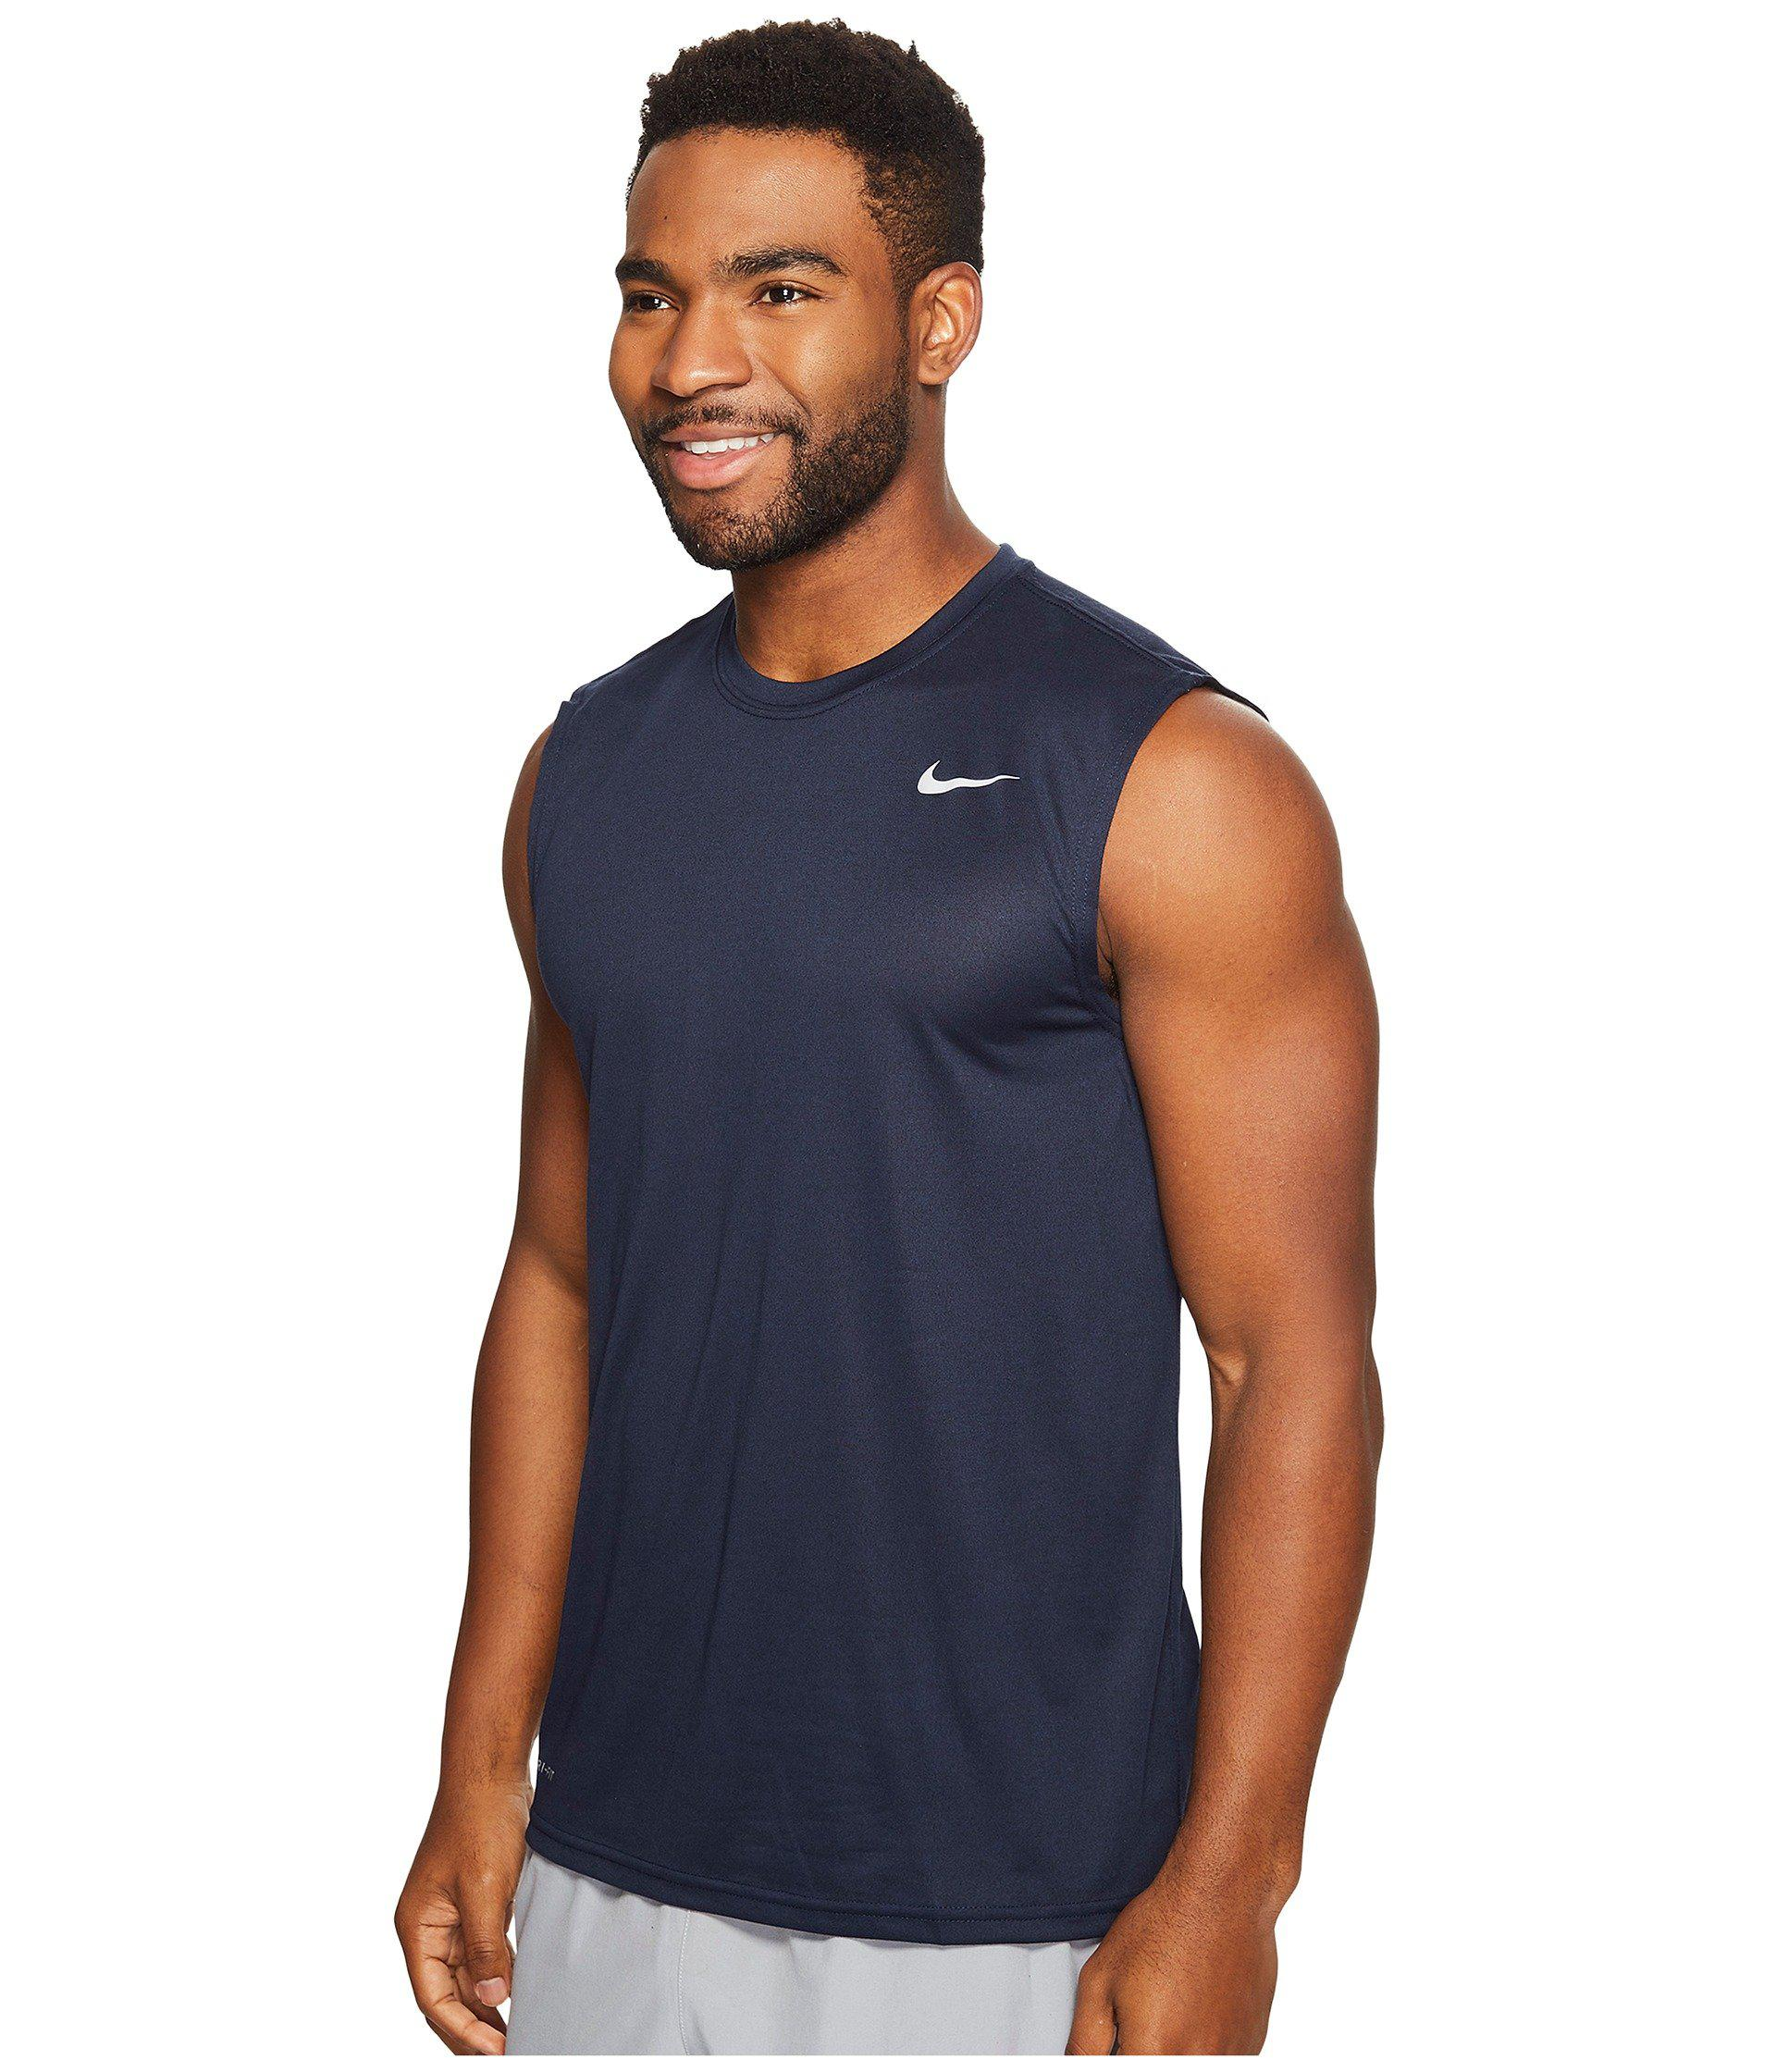 4e868d58 Nike Dri Fittm Legend Sleeveless Training Shirt - DREAMWORKS